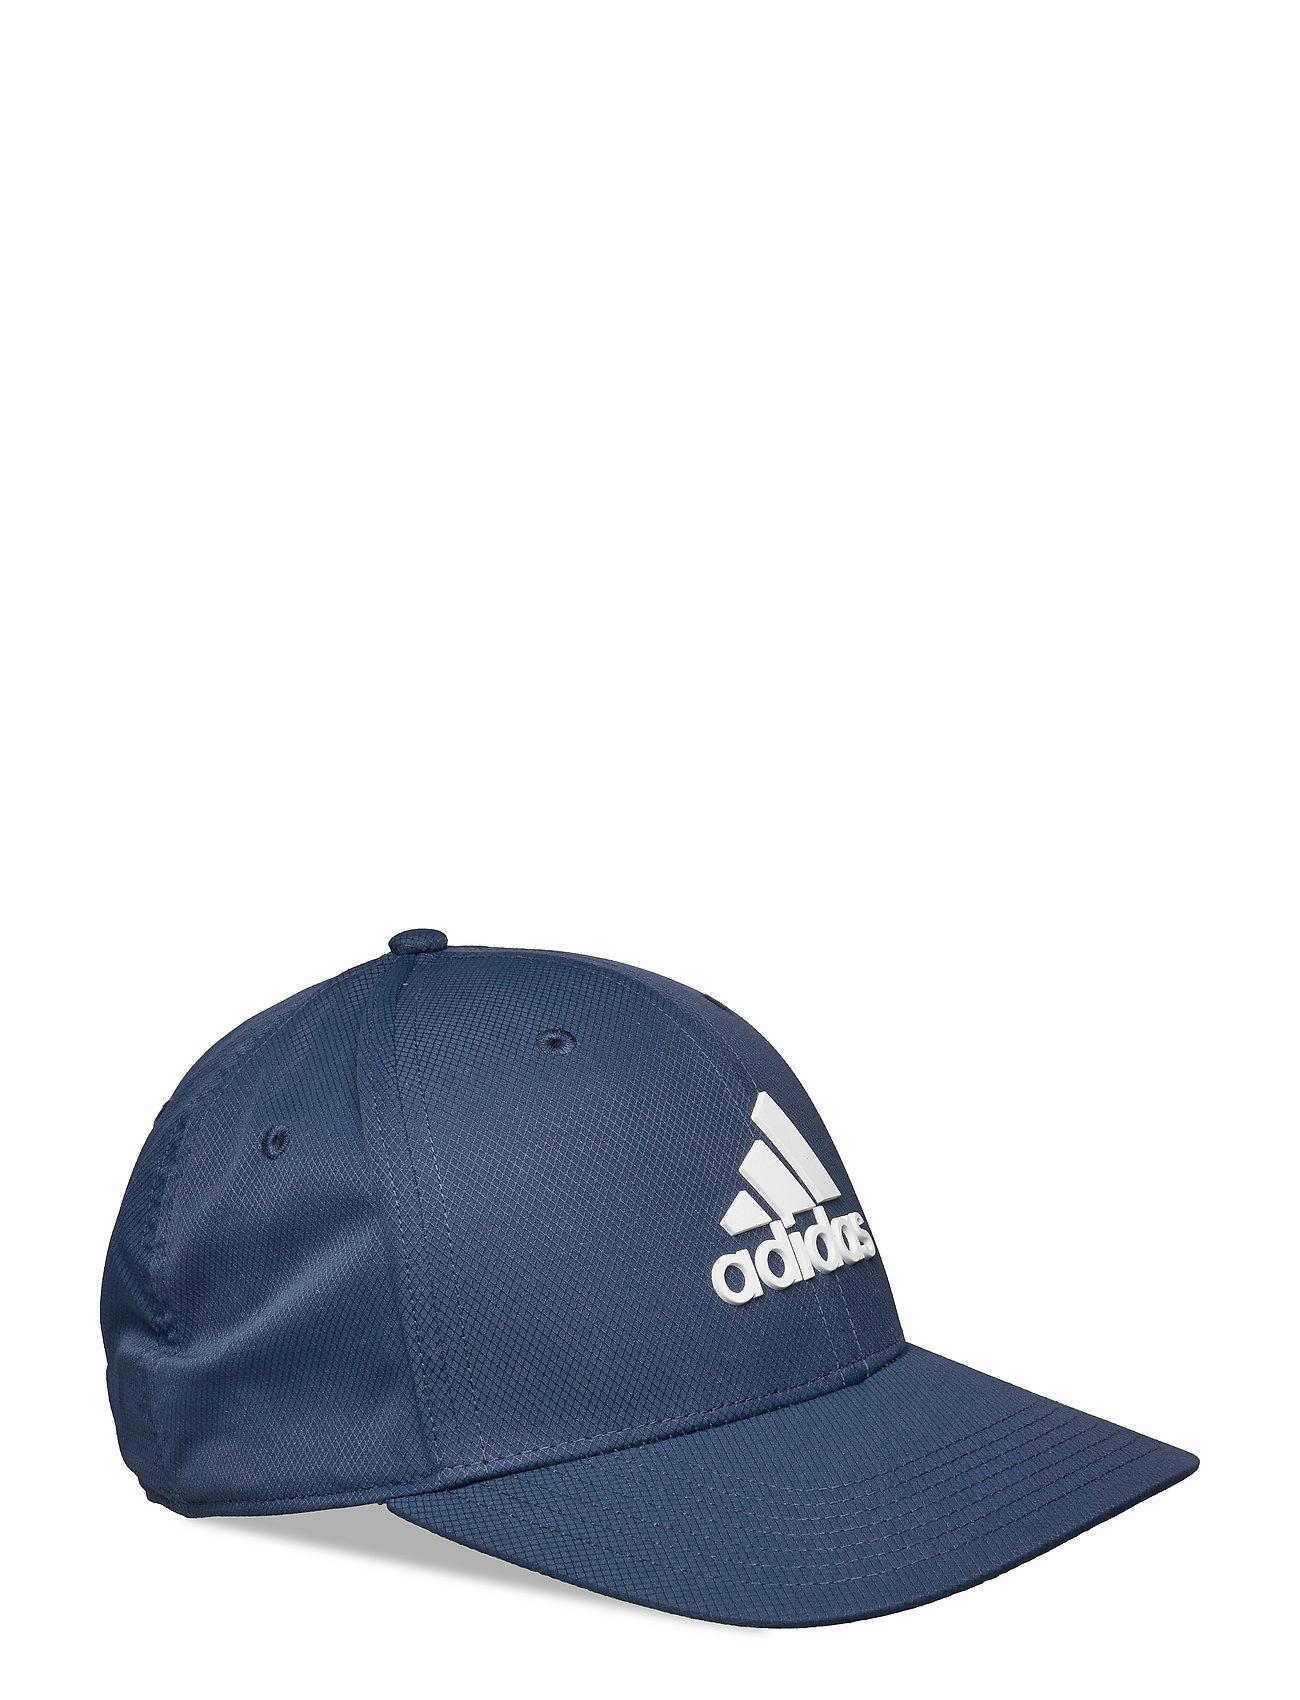 Tour Snapback Accessories Headwear Caps Blå Adidas Golf